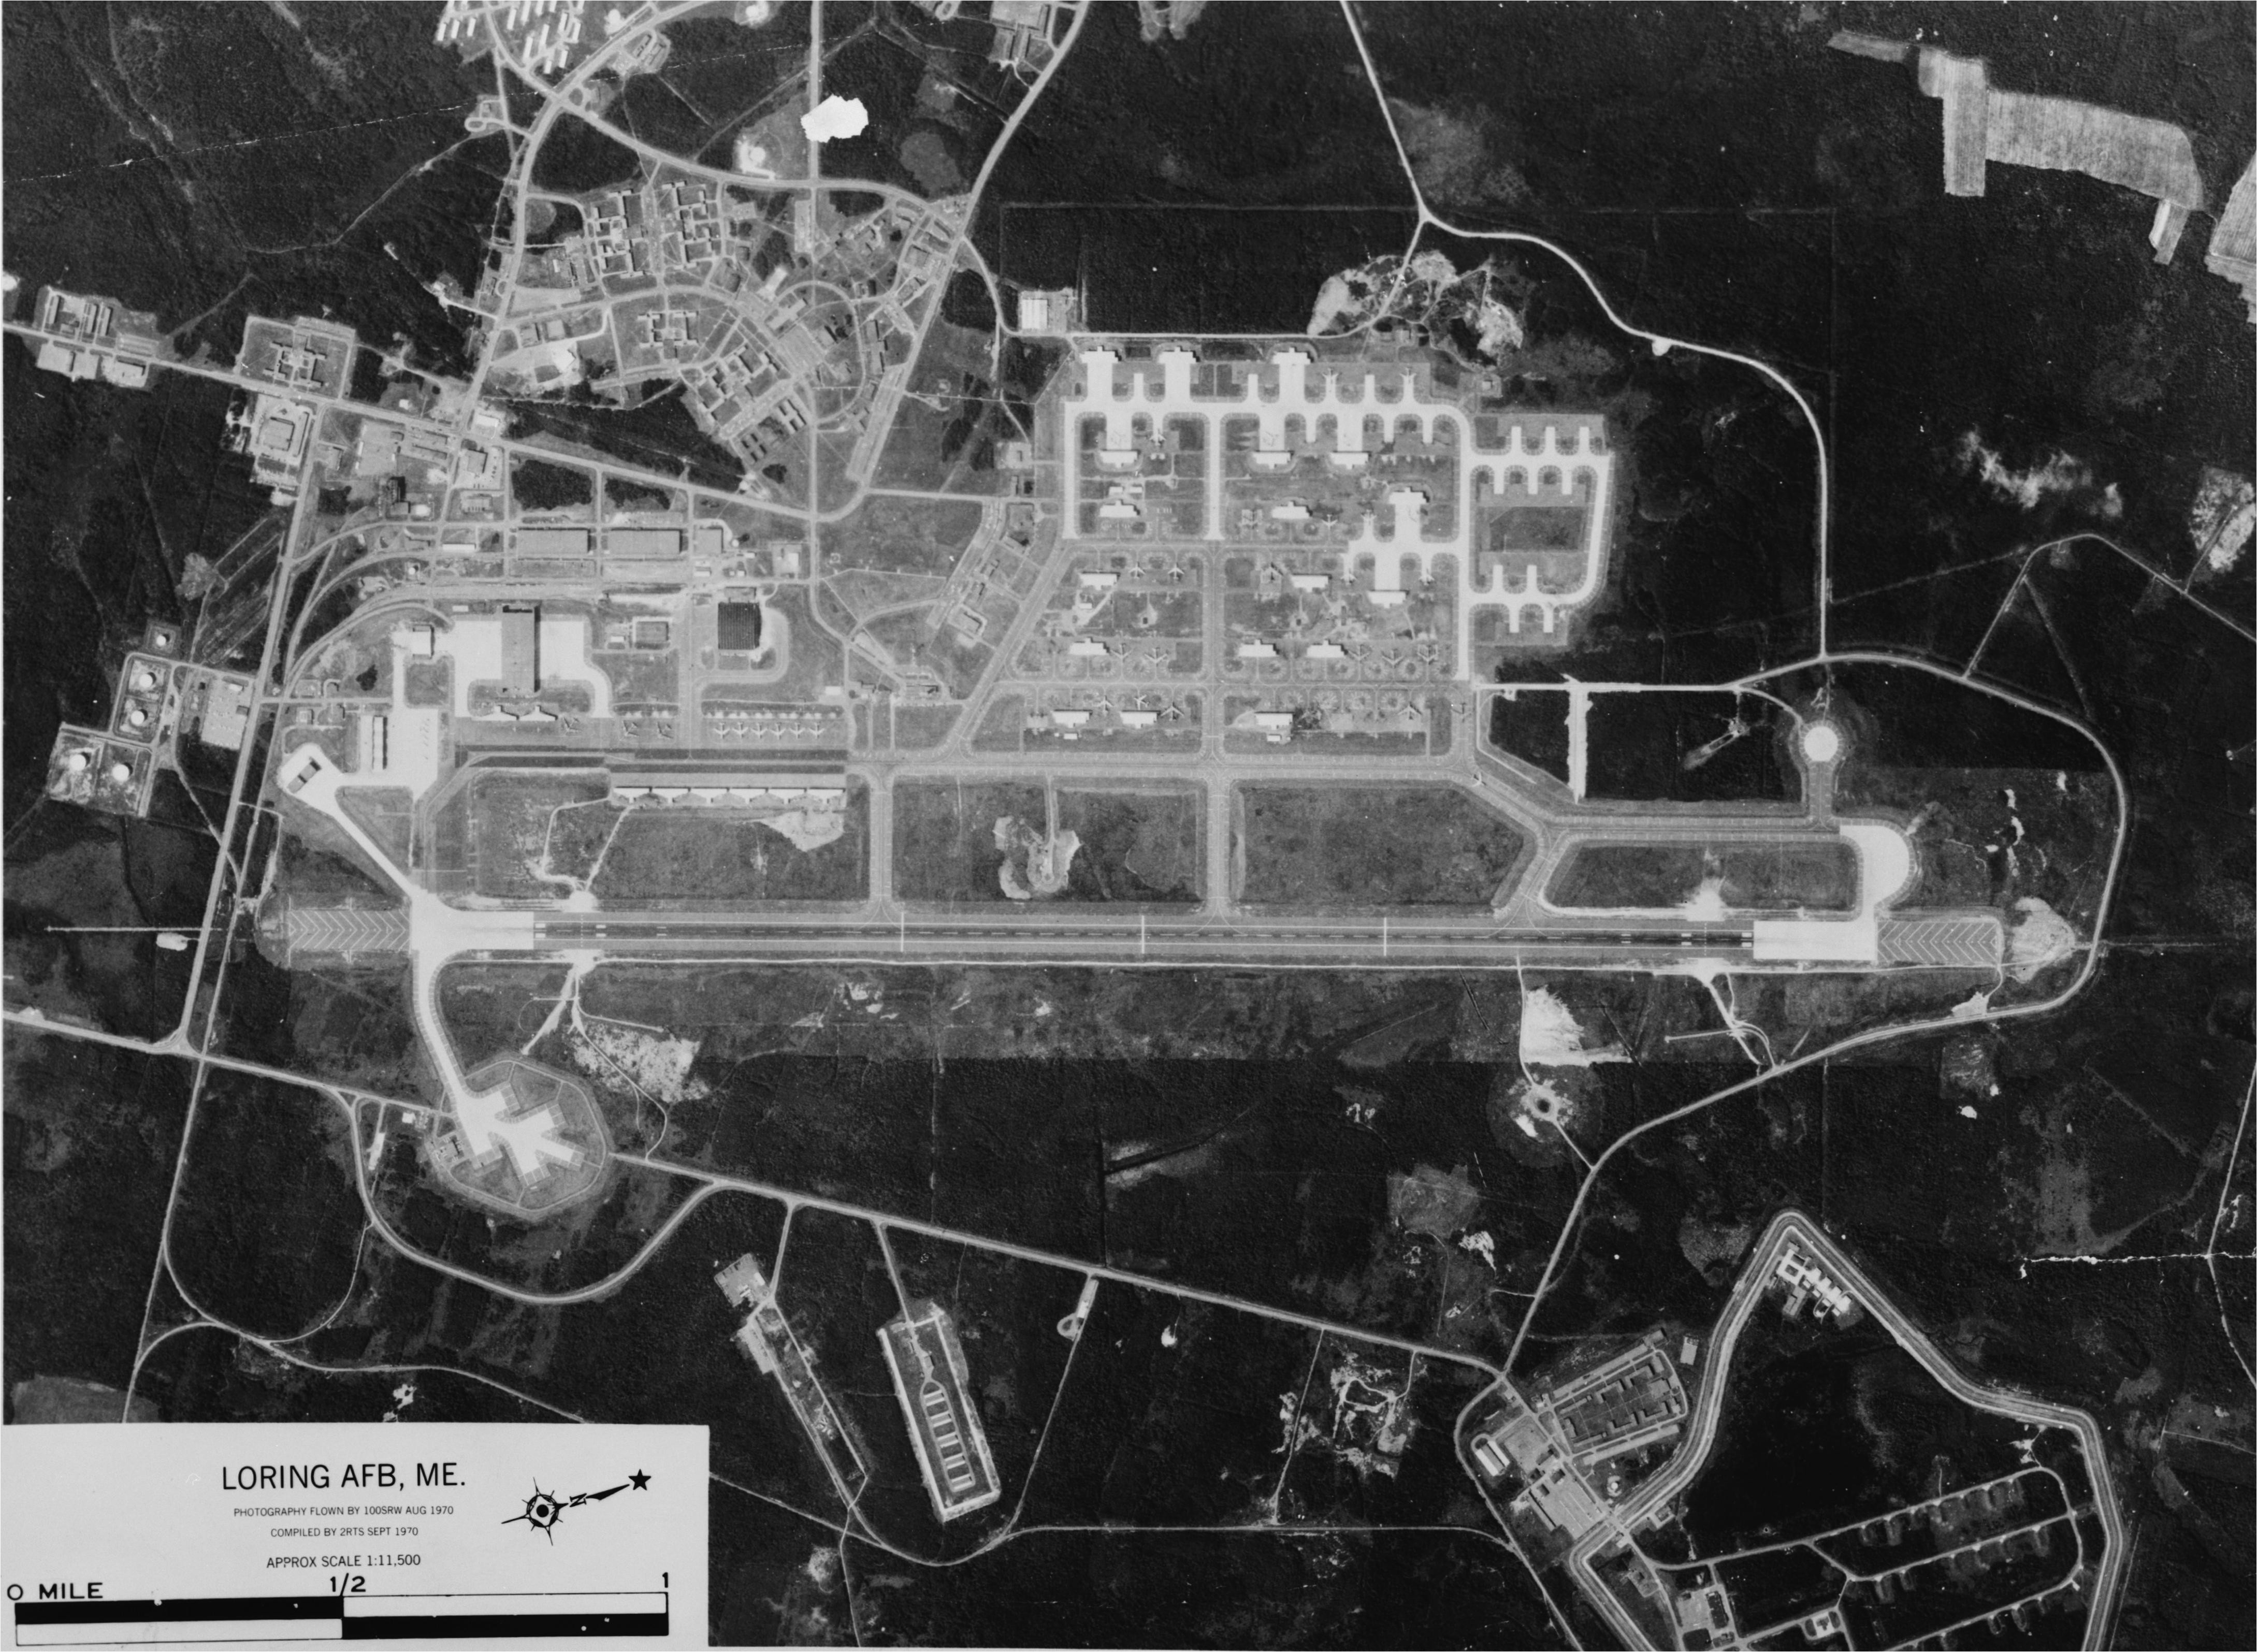 loring air force base jpg